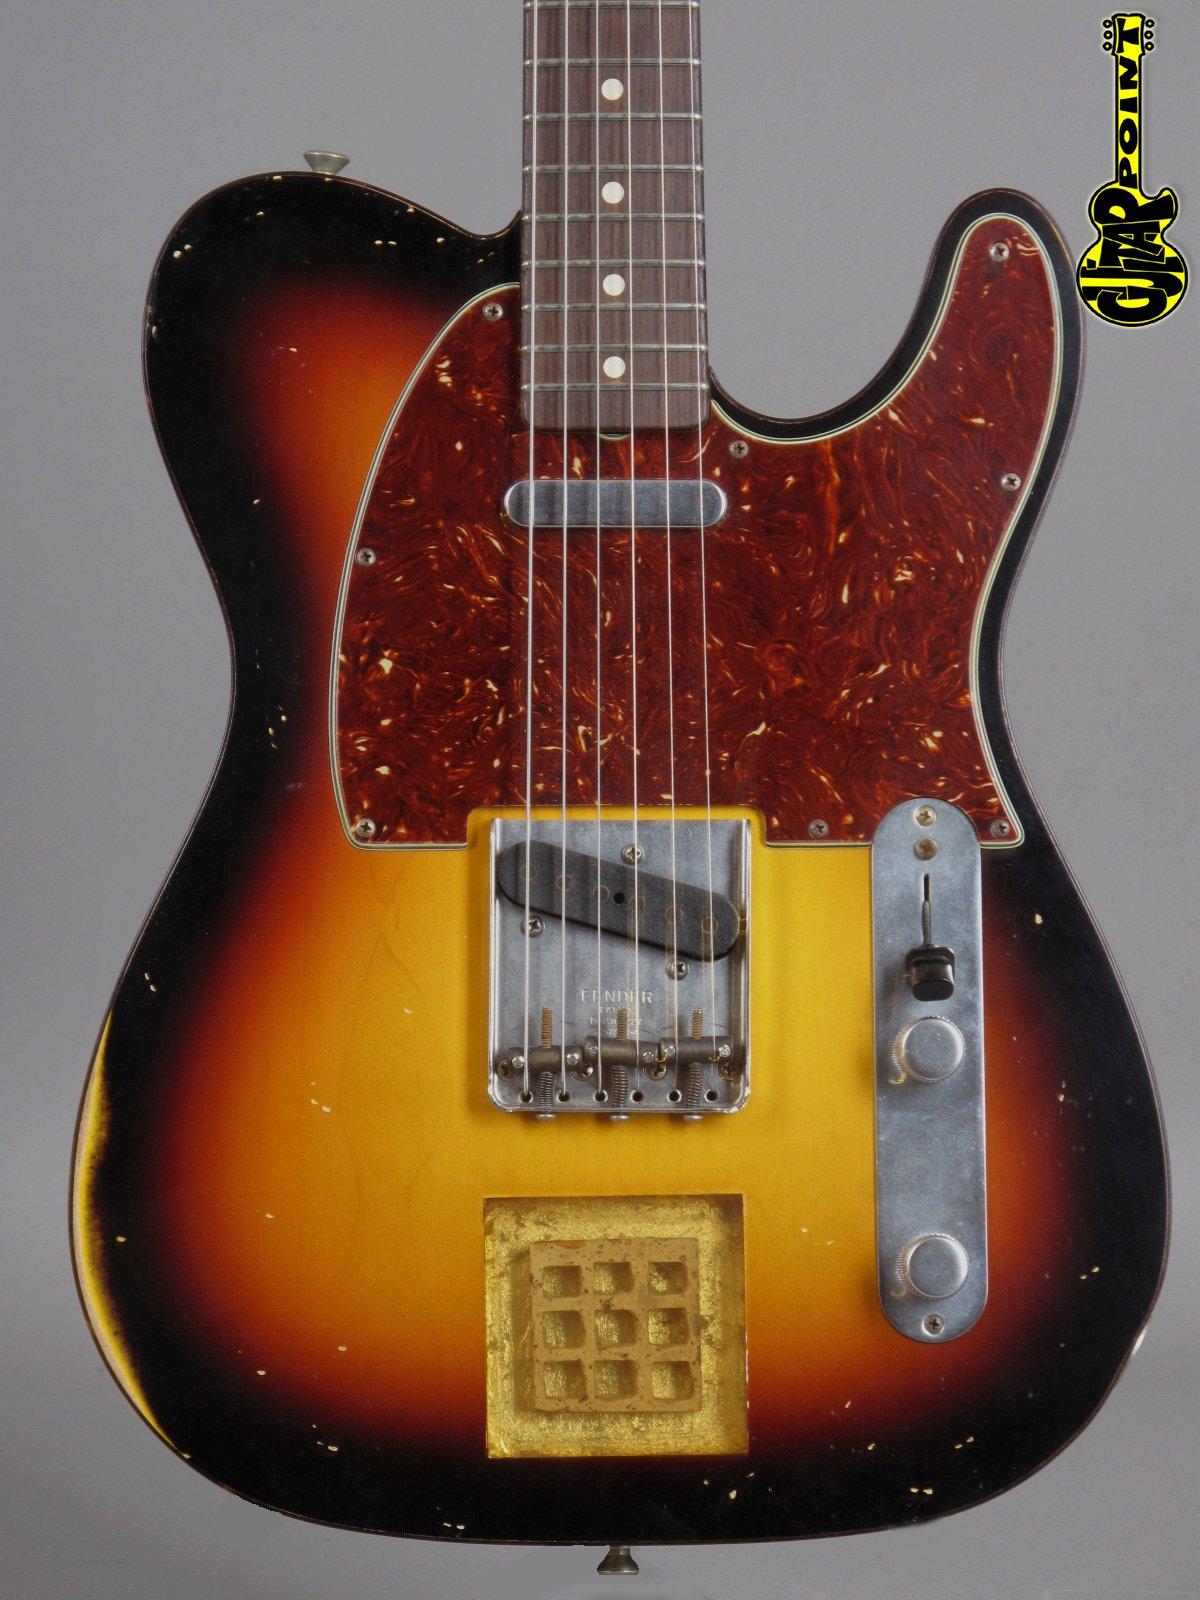 2008 Fender Masterbuilt 60s Relic Beatclub Telecaster No.1 of 10